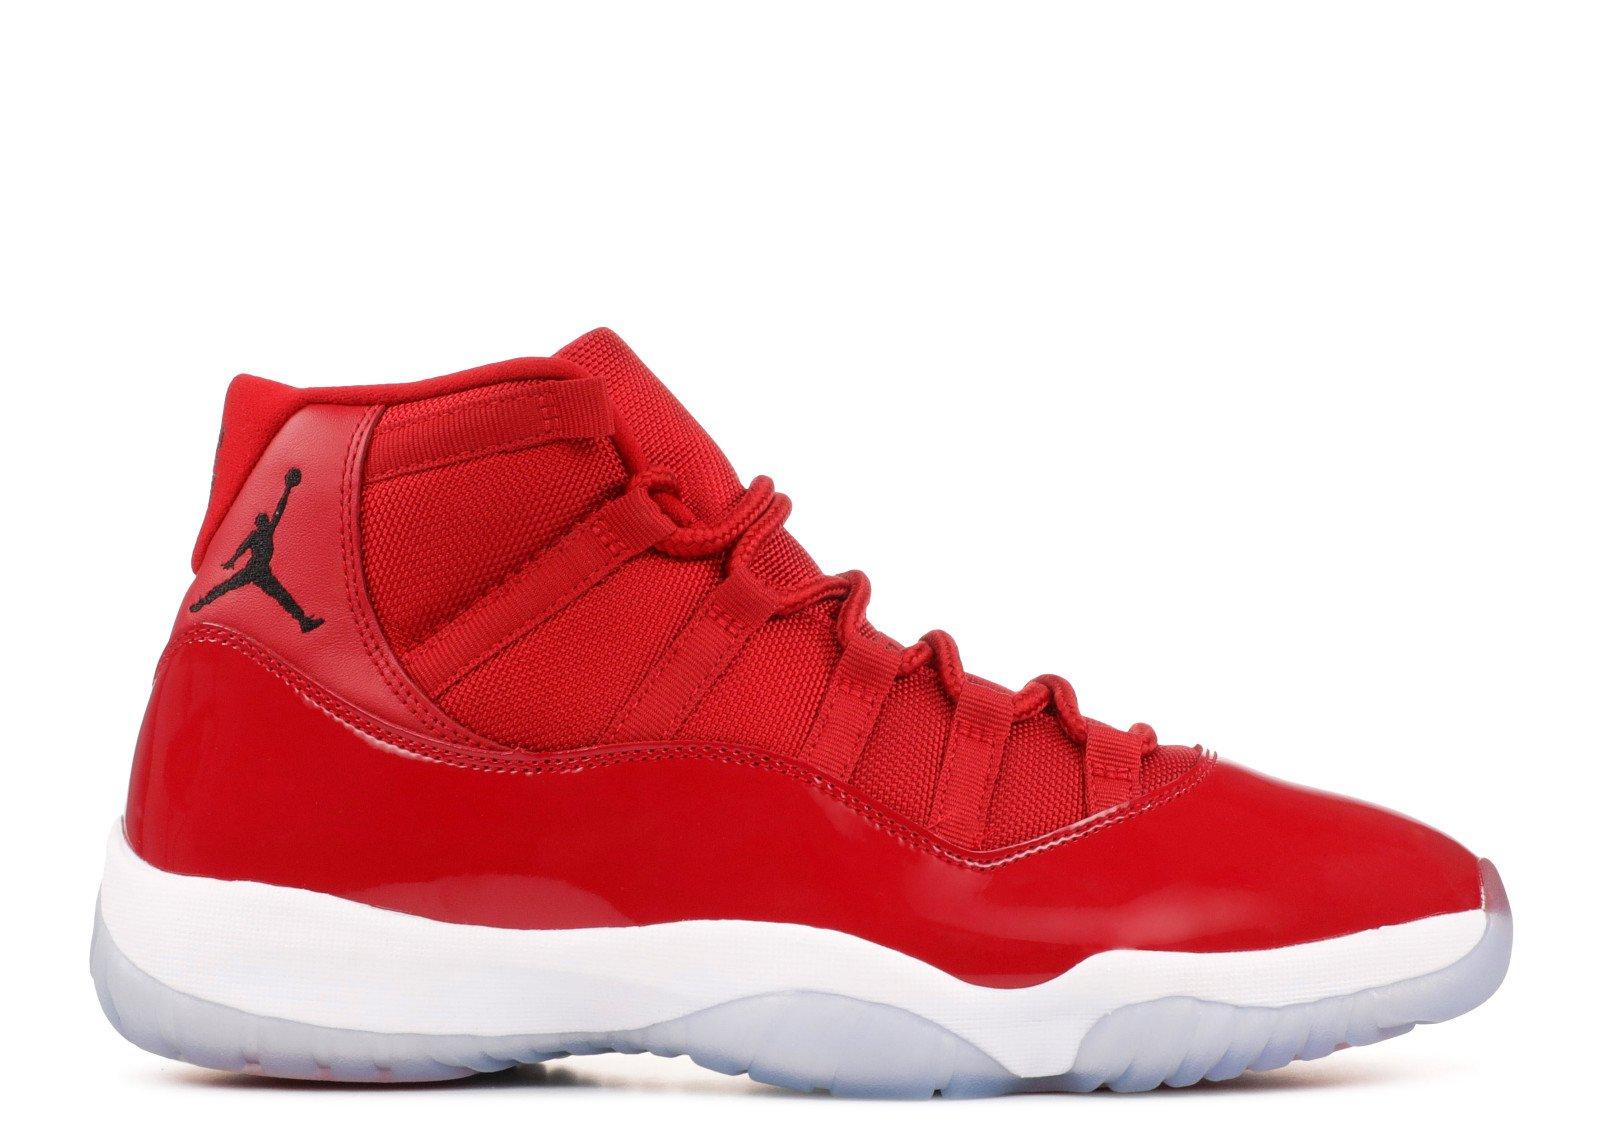 "Air Jordan 11 Retro ""Win Like '96"" - Air Jordan - 378037 623 - gym red/black-white | Flight Club"